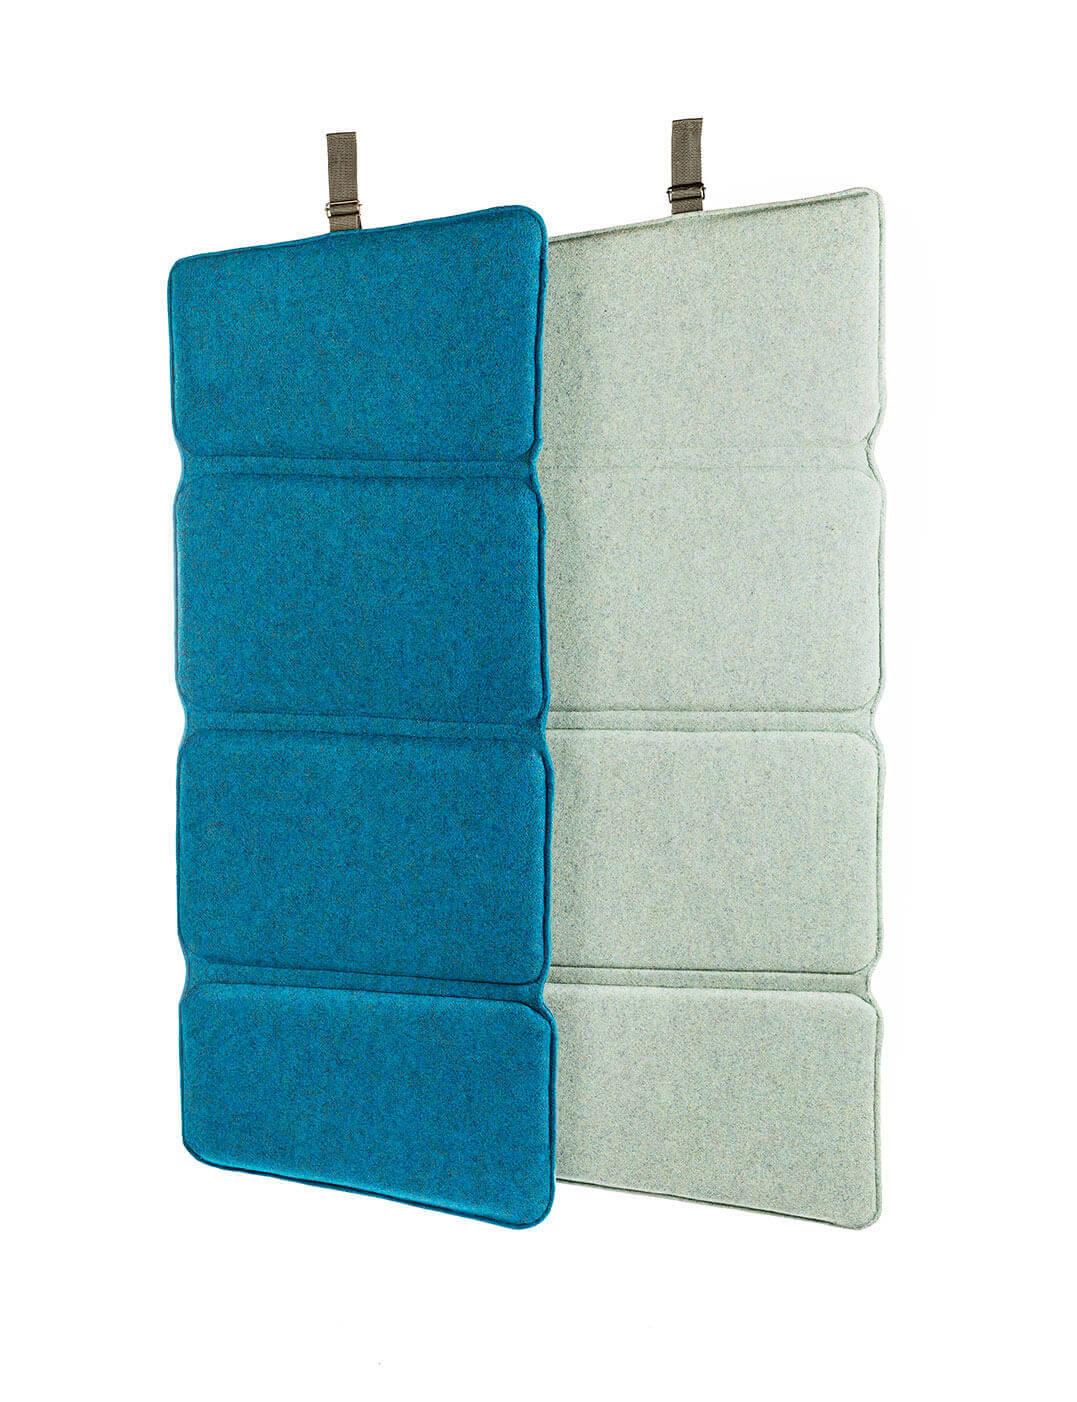 Acoustic flex-screen: room-divider, wall-panel, desk-screen. Sound comfort for flex working